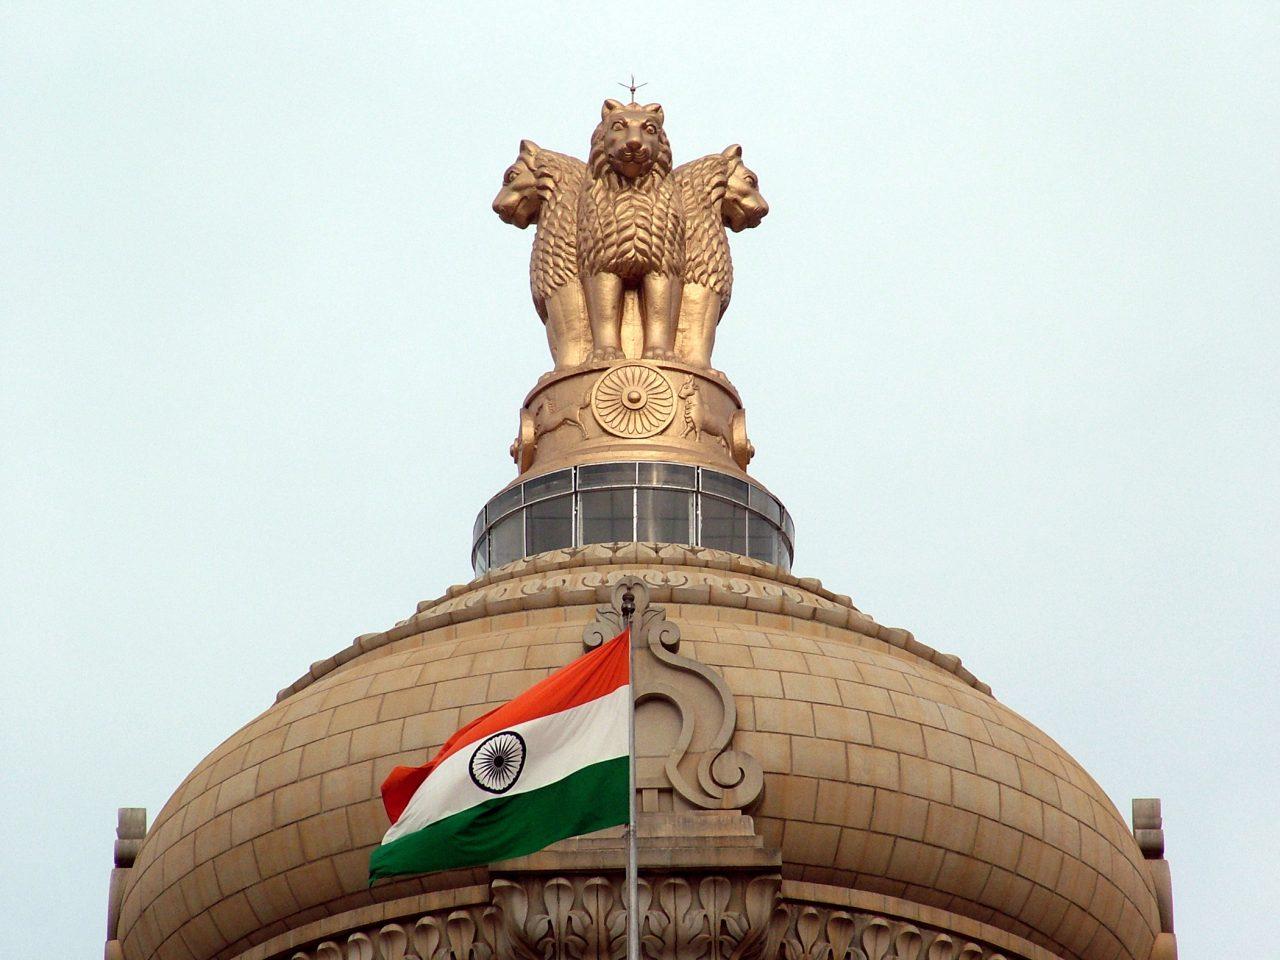 В IV квартале рост ВВП Индии замедлился до 4,7%